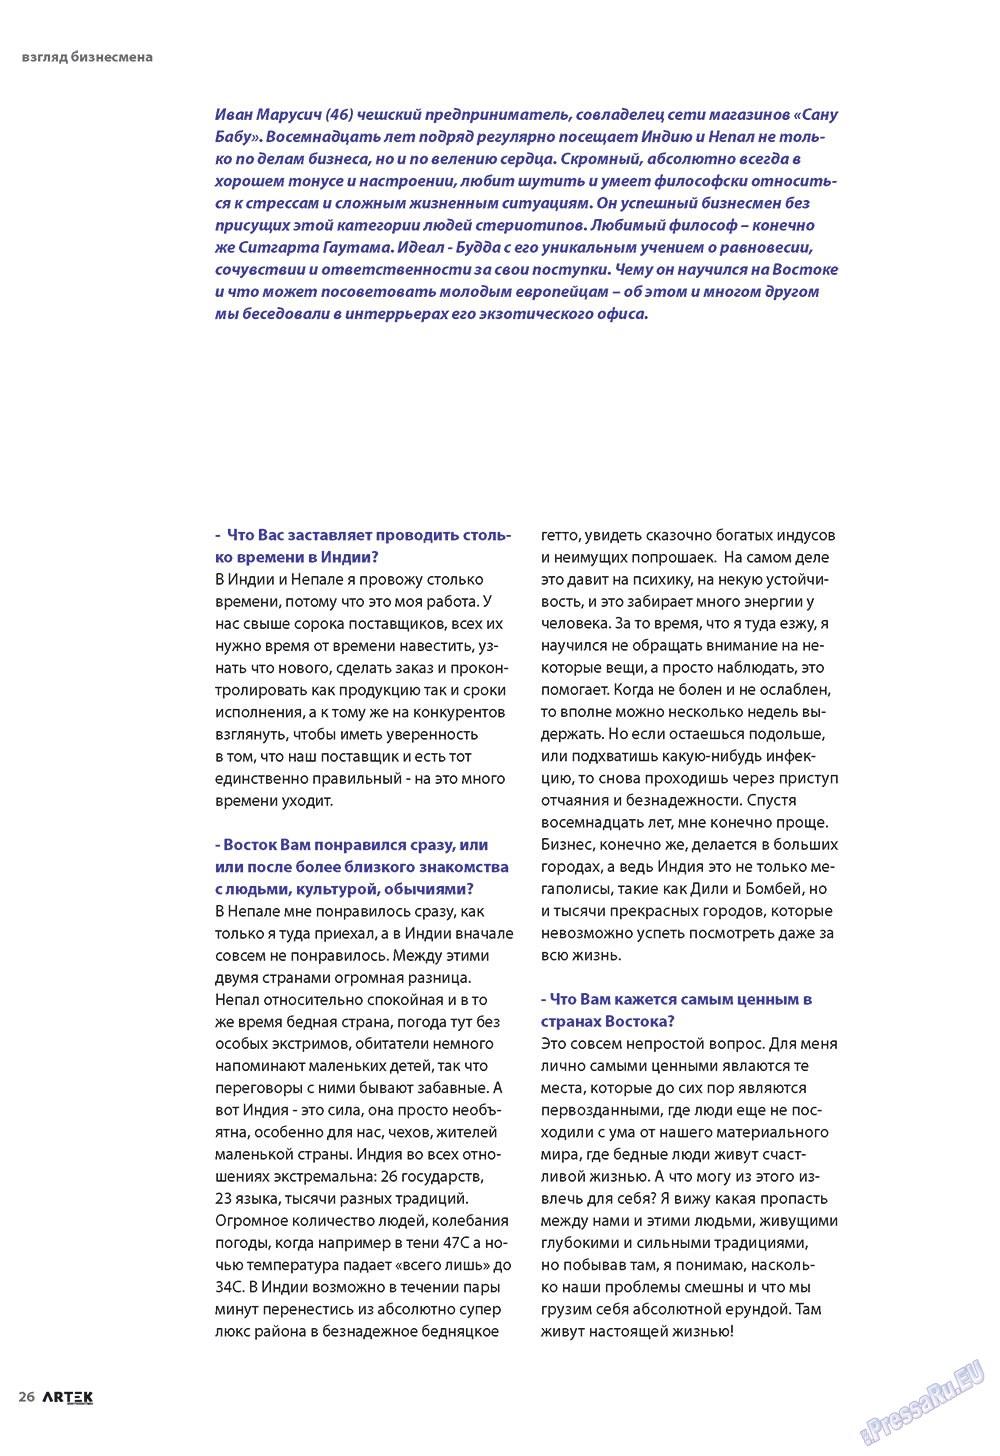 Артек (журнал). 2009 год, номер 5, стр. 26